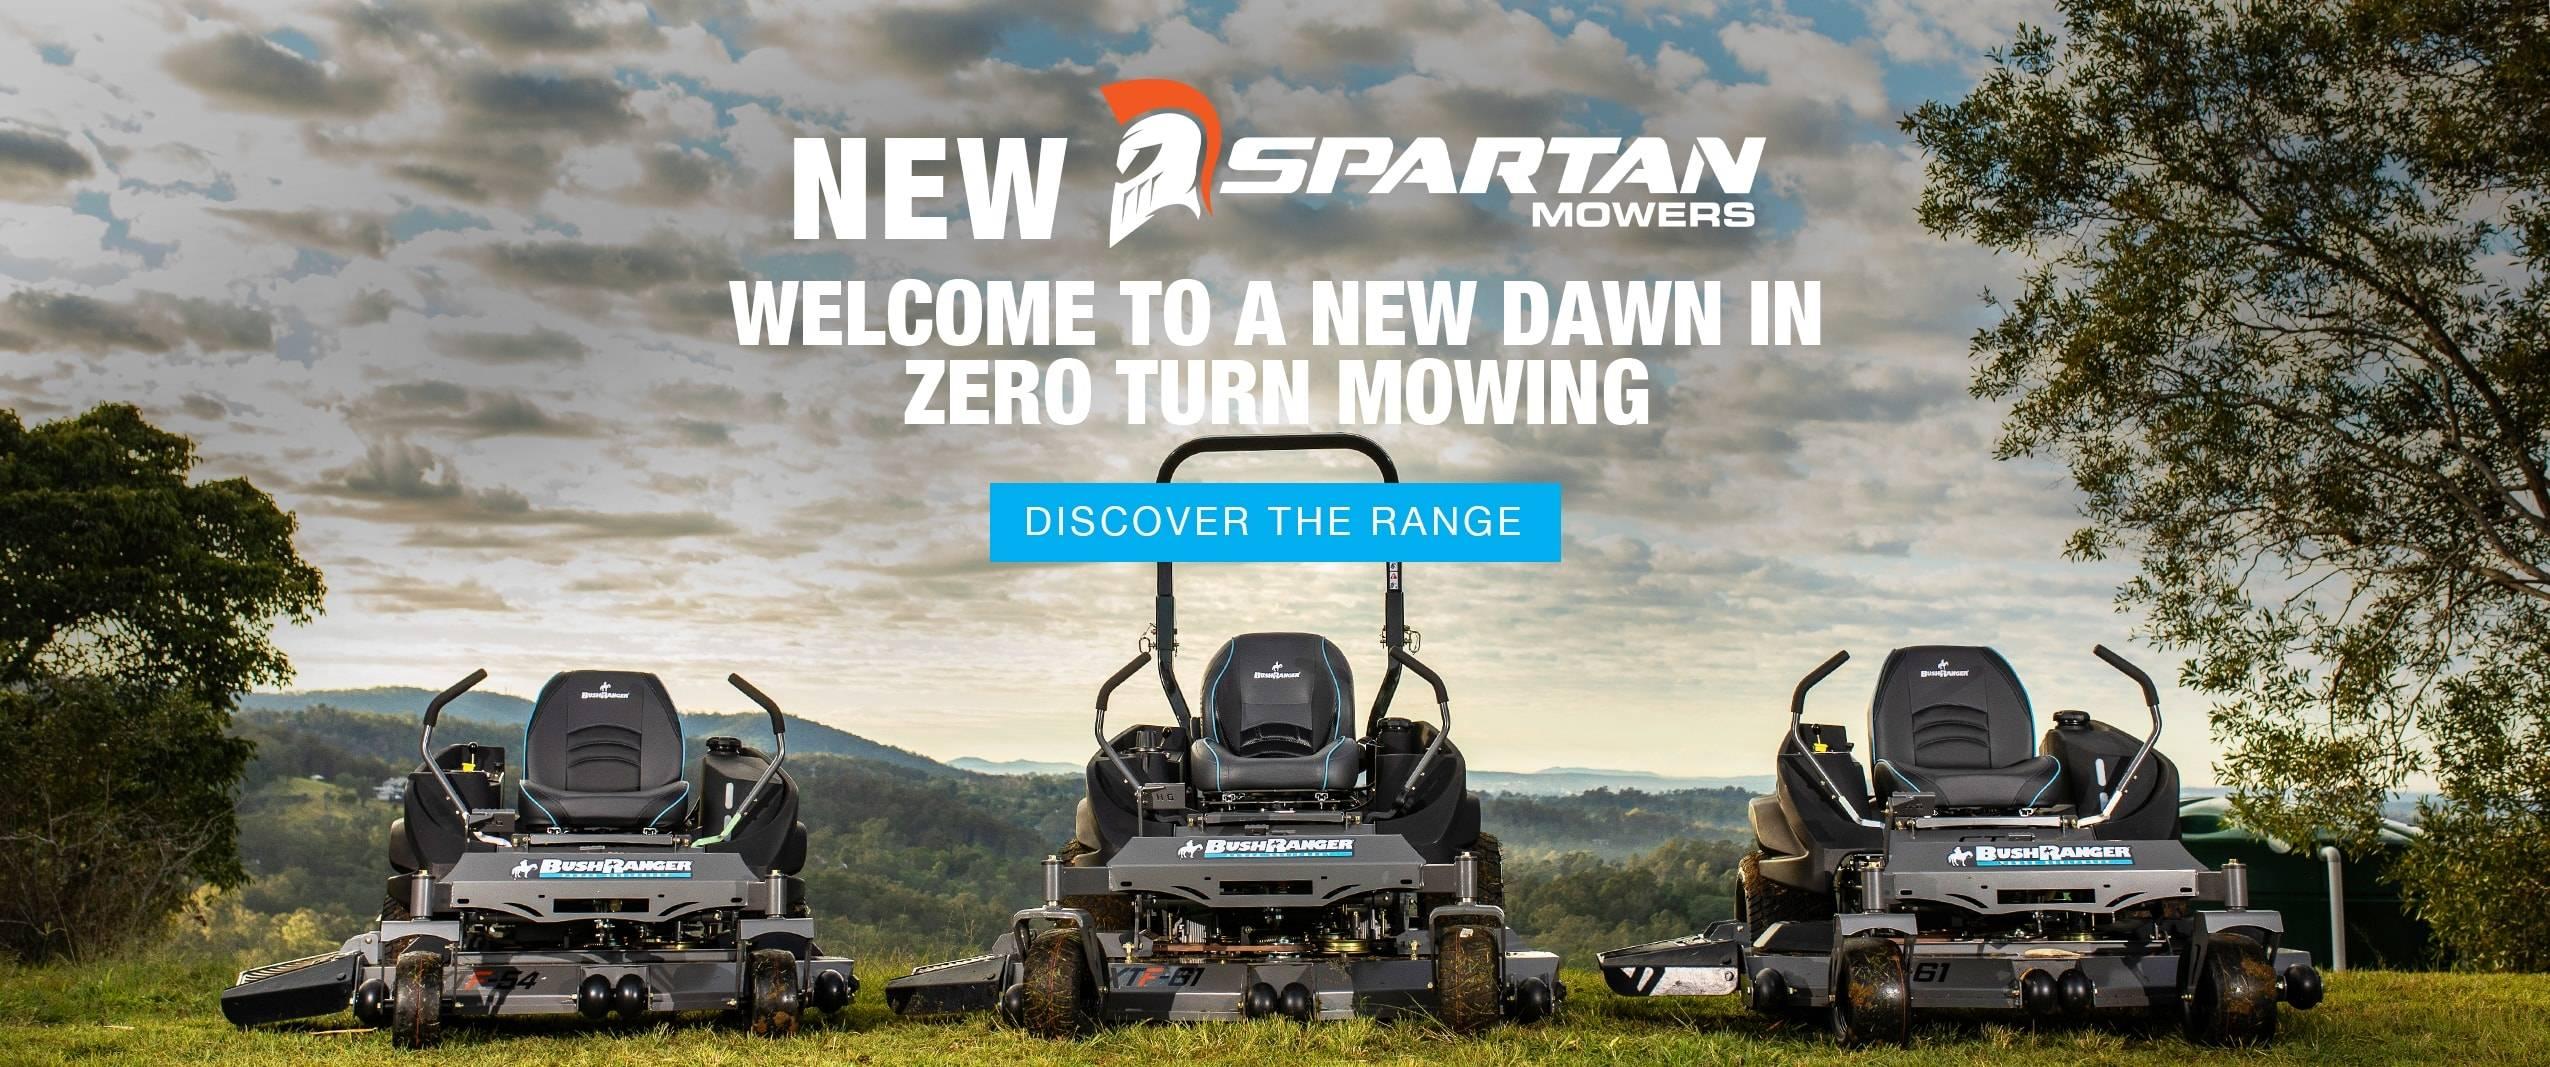 bushranger-spartancoming-soon-web-banner-min